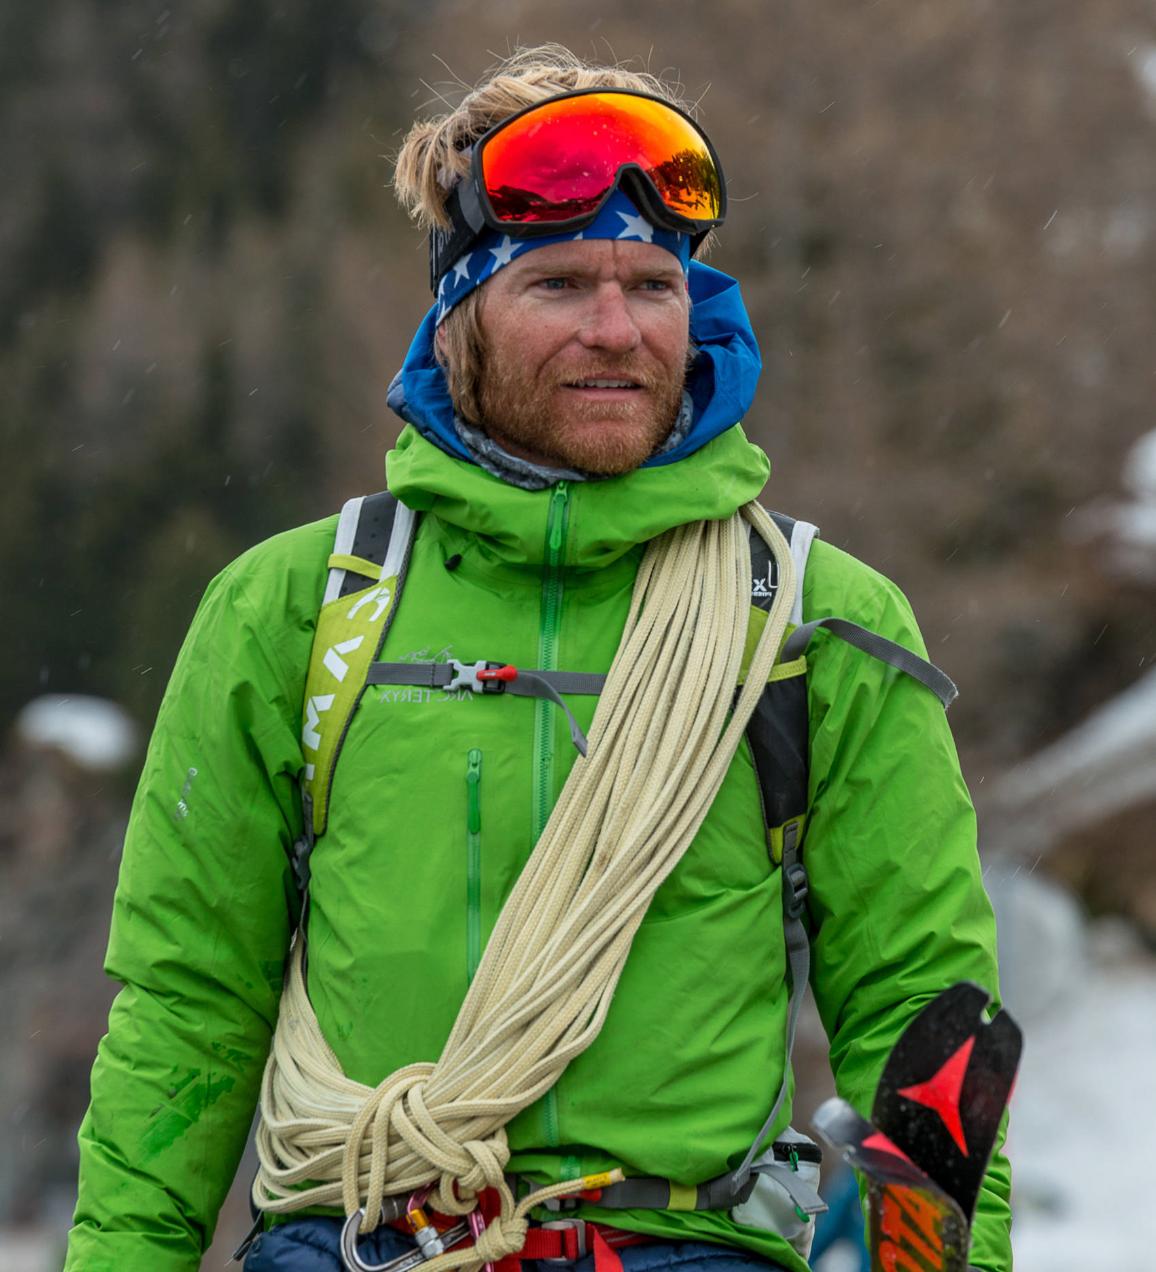 Mark Smiley